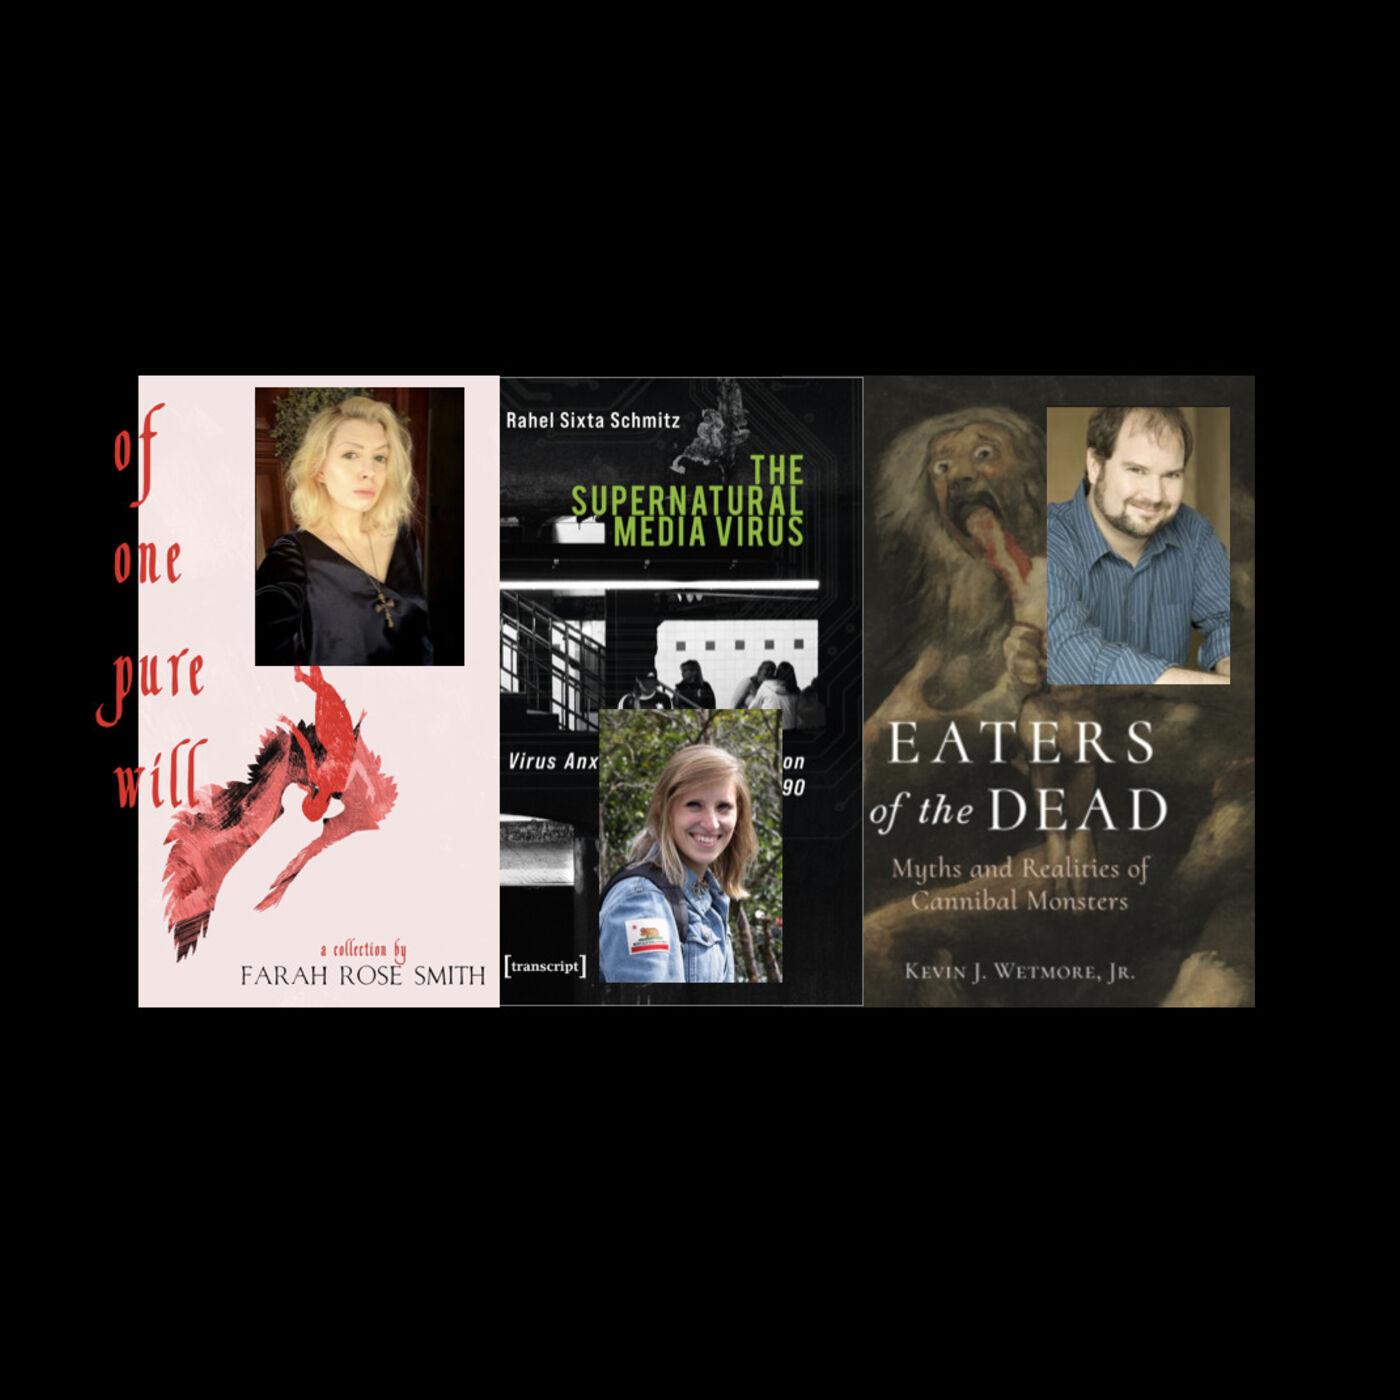 HPLCP Transmissions - Ep 06 - Farah Rose Smith, Rahel Sixta Schmitz, and Kevin Wetmore